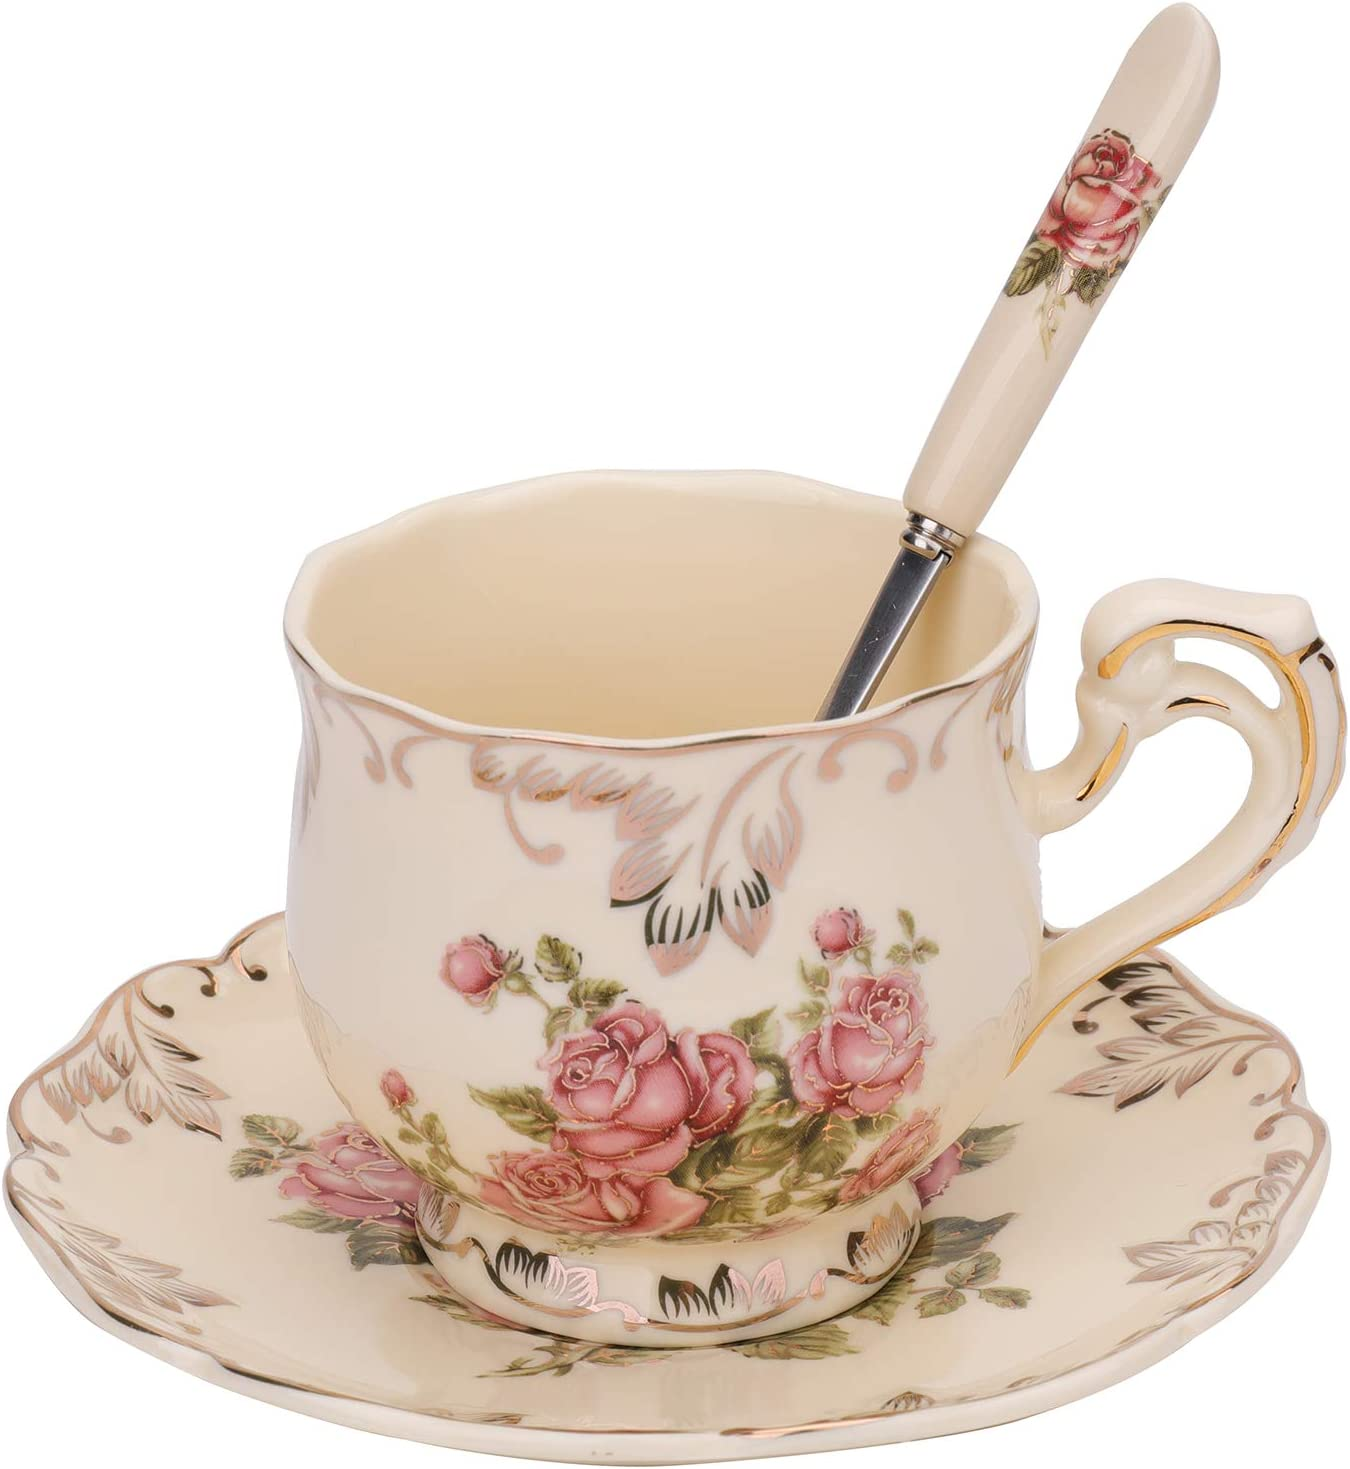 Amazon Com Foraineam Tea Cup And Saucer Set 8 Oz Ivory Porcelain Coffee Cup Vintage Floral Ceramic Tea Cup Set With Saucer And Spoon Cup Saucer Sets